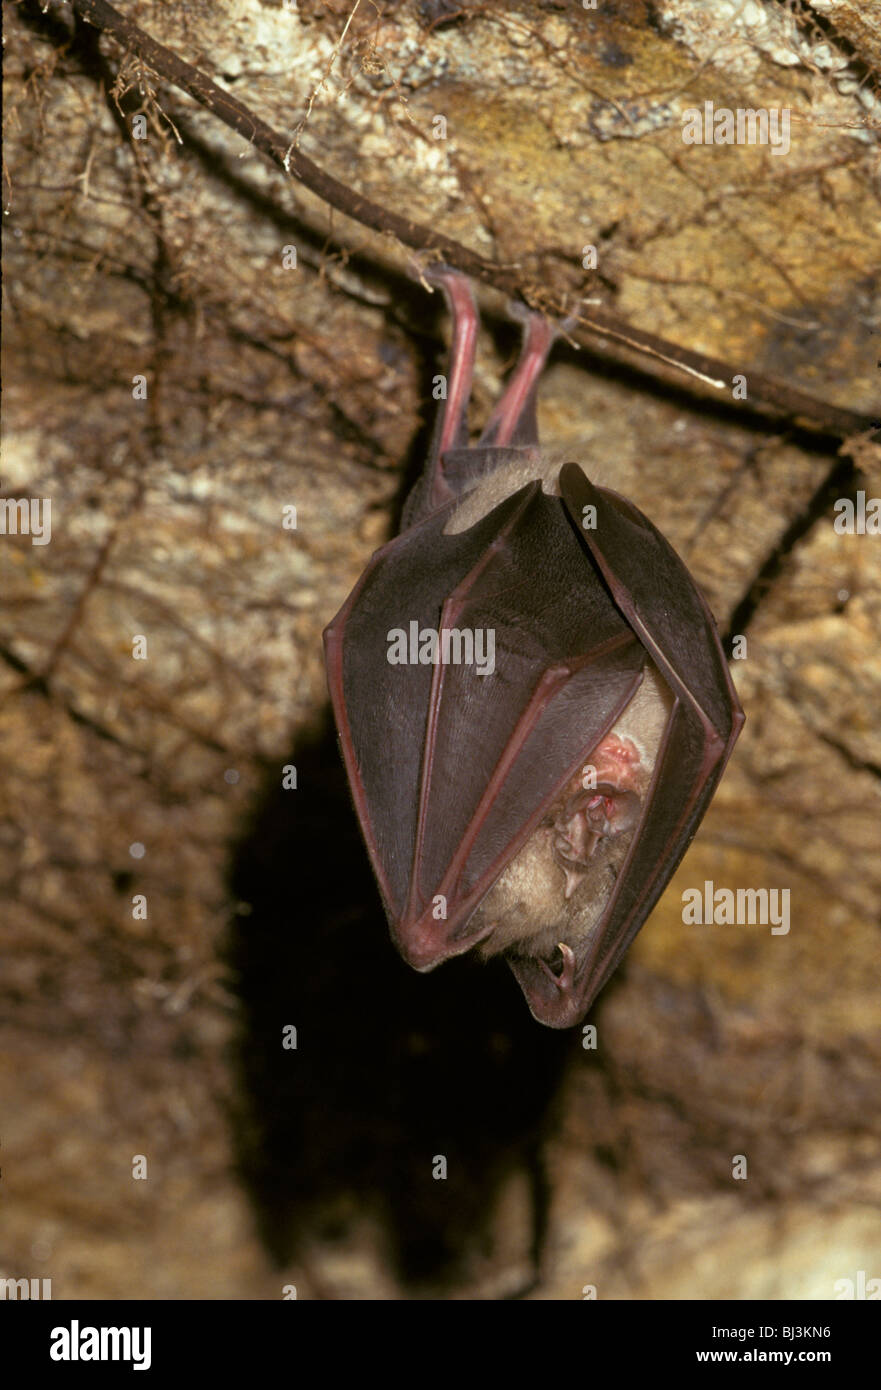 Greater Horseshoe Bat (Rhinolophus ferrumequinum) hibernating in cave, body wrapped in wings - Stock Image